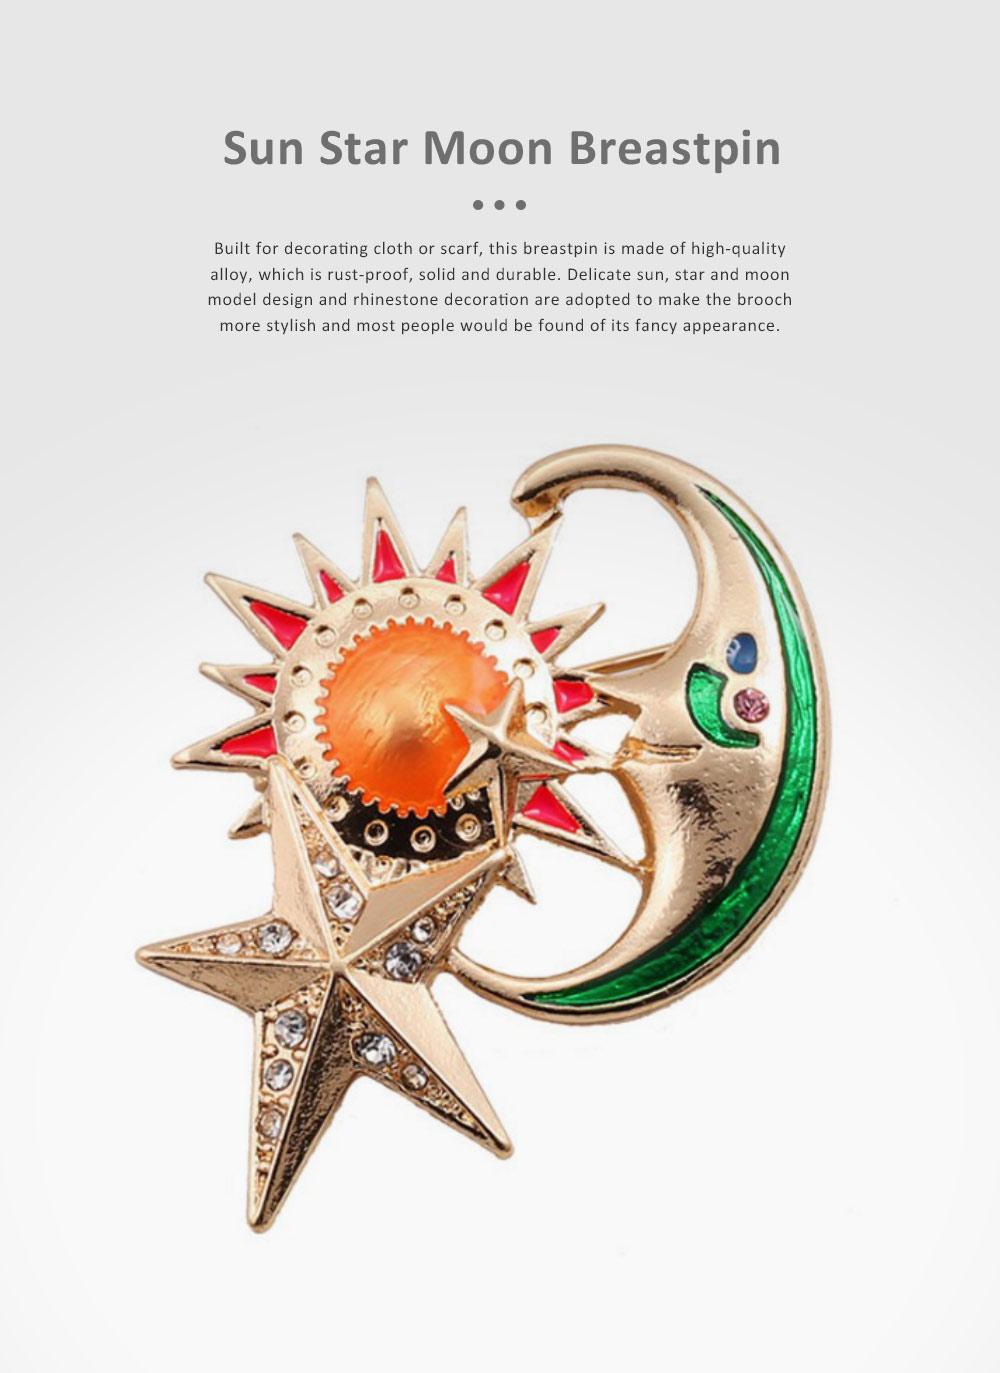 Sun Star Moon Breastpin, Fancy Delicate Shiny Alloy Brooch Scarf Ornament Oil-spot Glaze Rhinestone Decoration Brooch 0